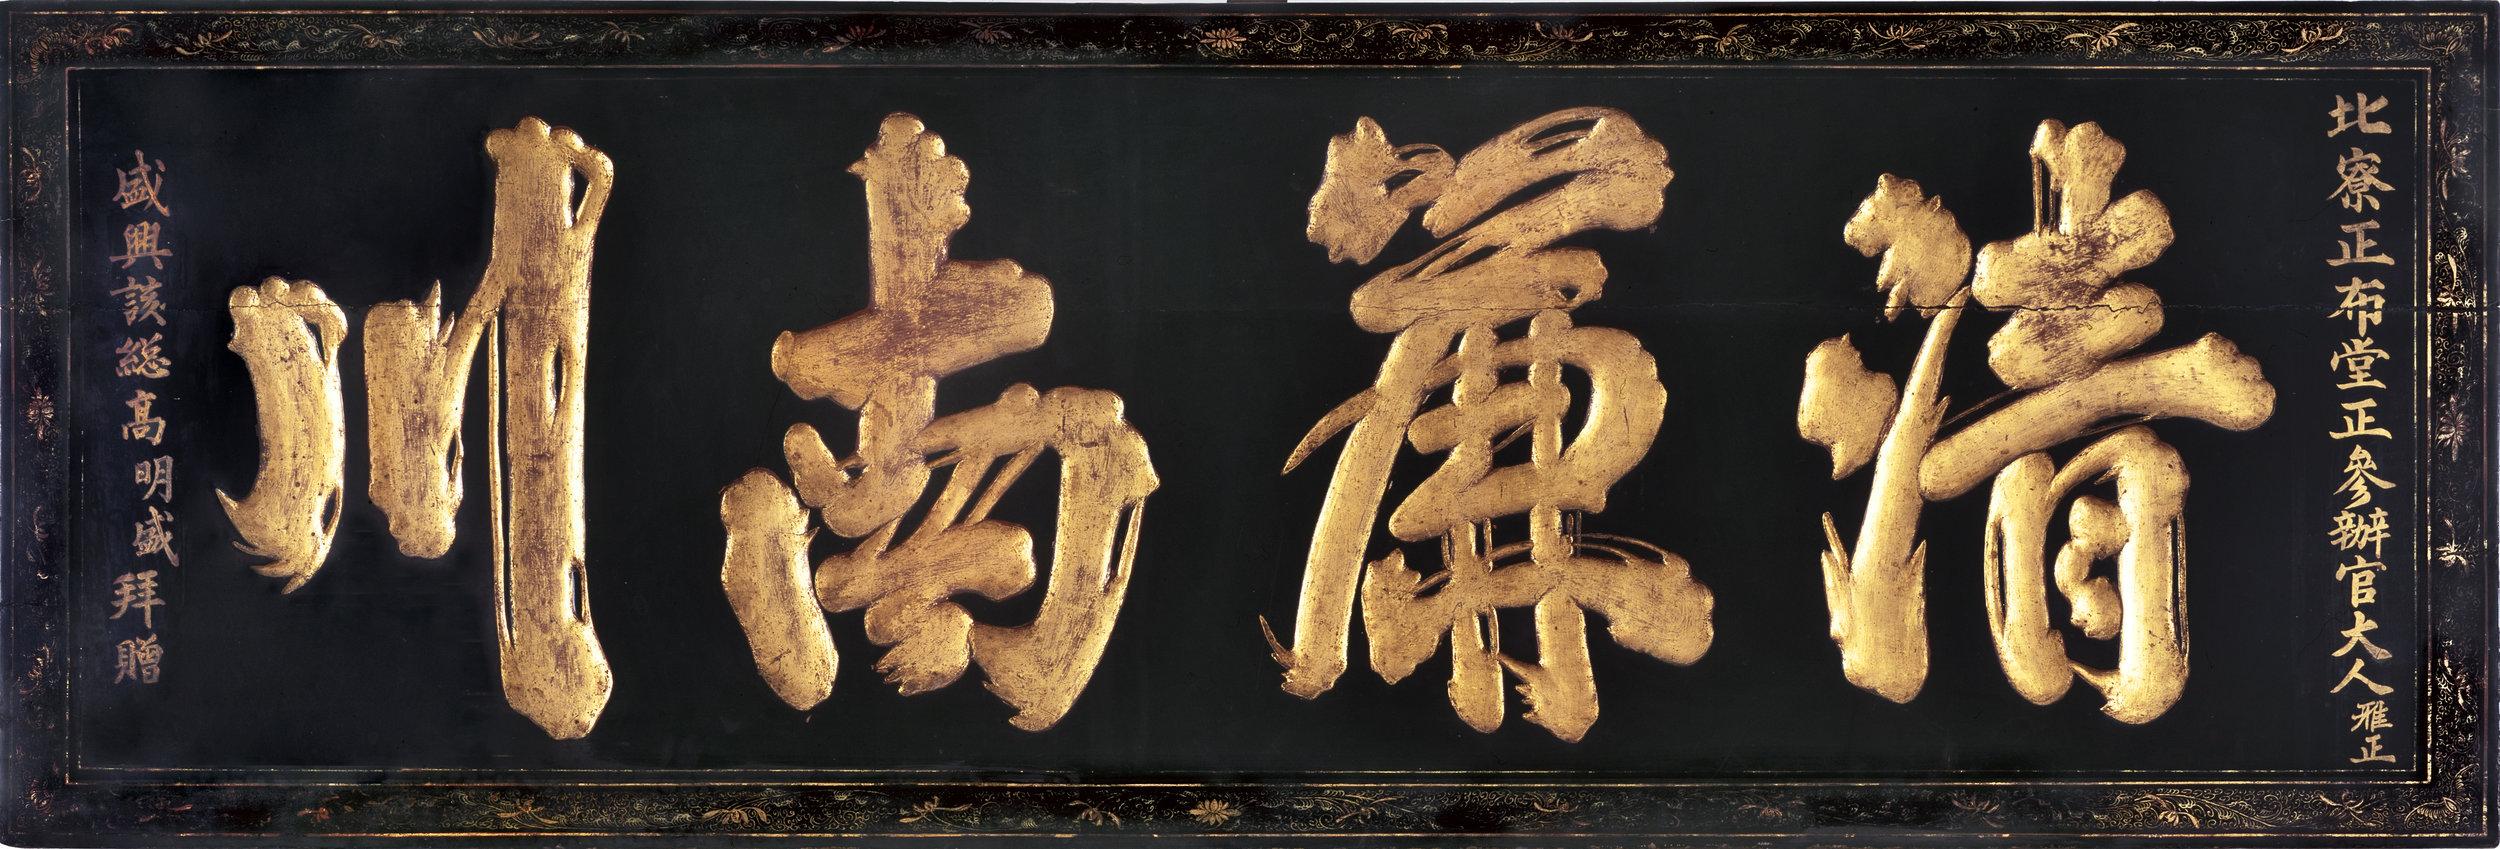 China, 19th century, Qing dynasty